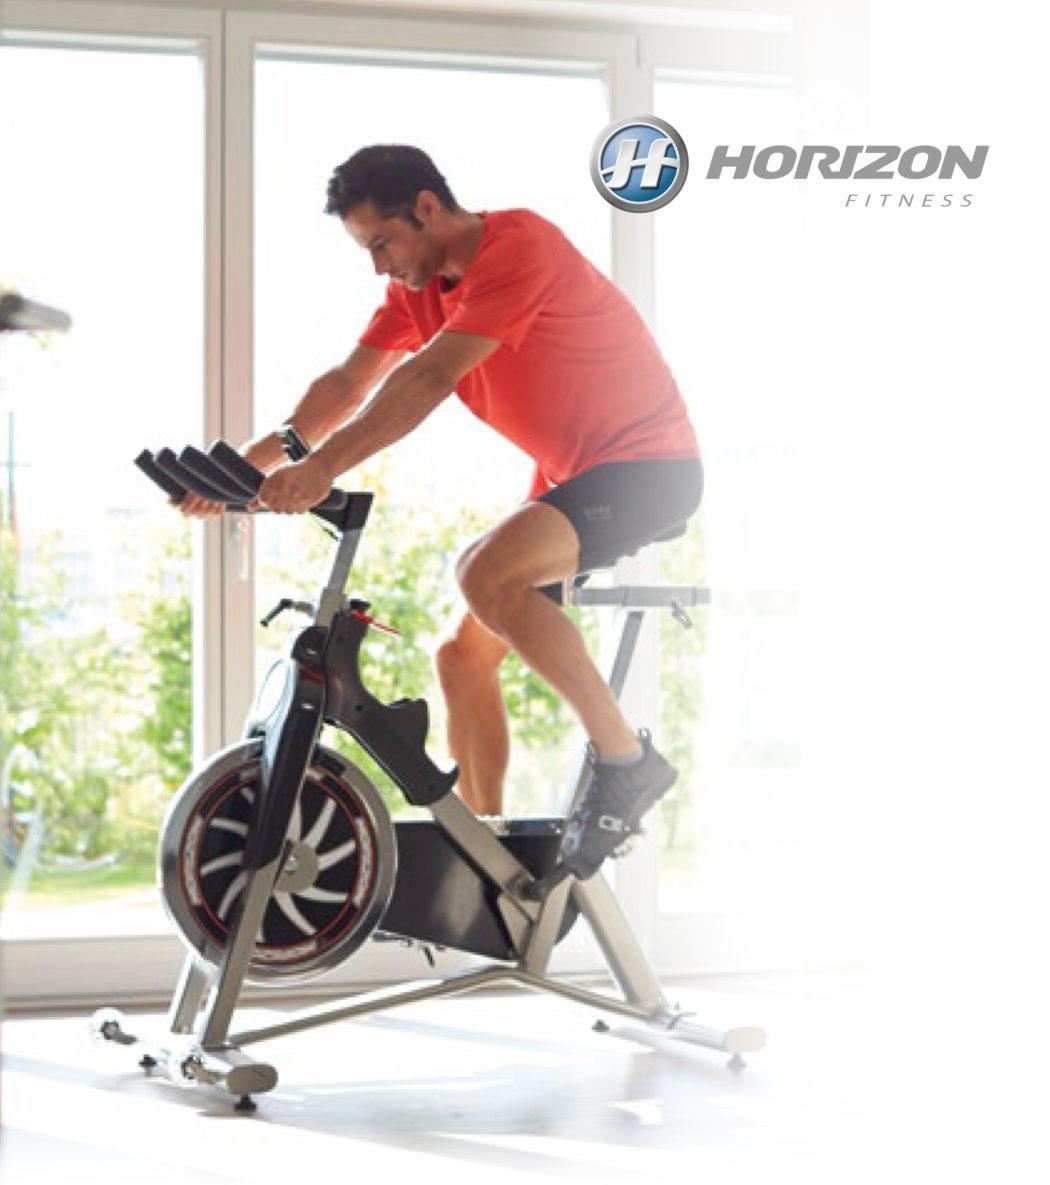 https://www.indoorcycling.org/magazin/wp-content/uploads/2016/11/horizon-fitness-1050x1185.jpg